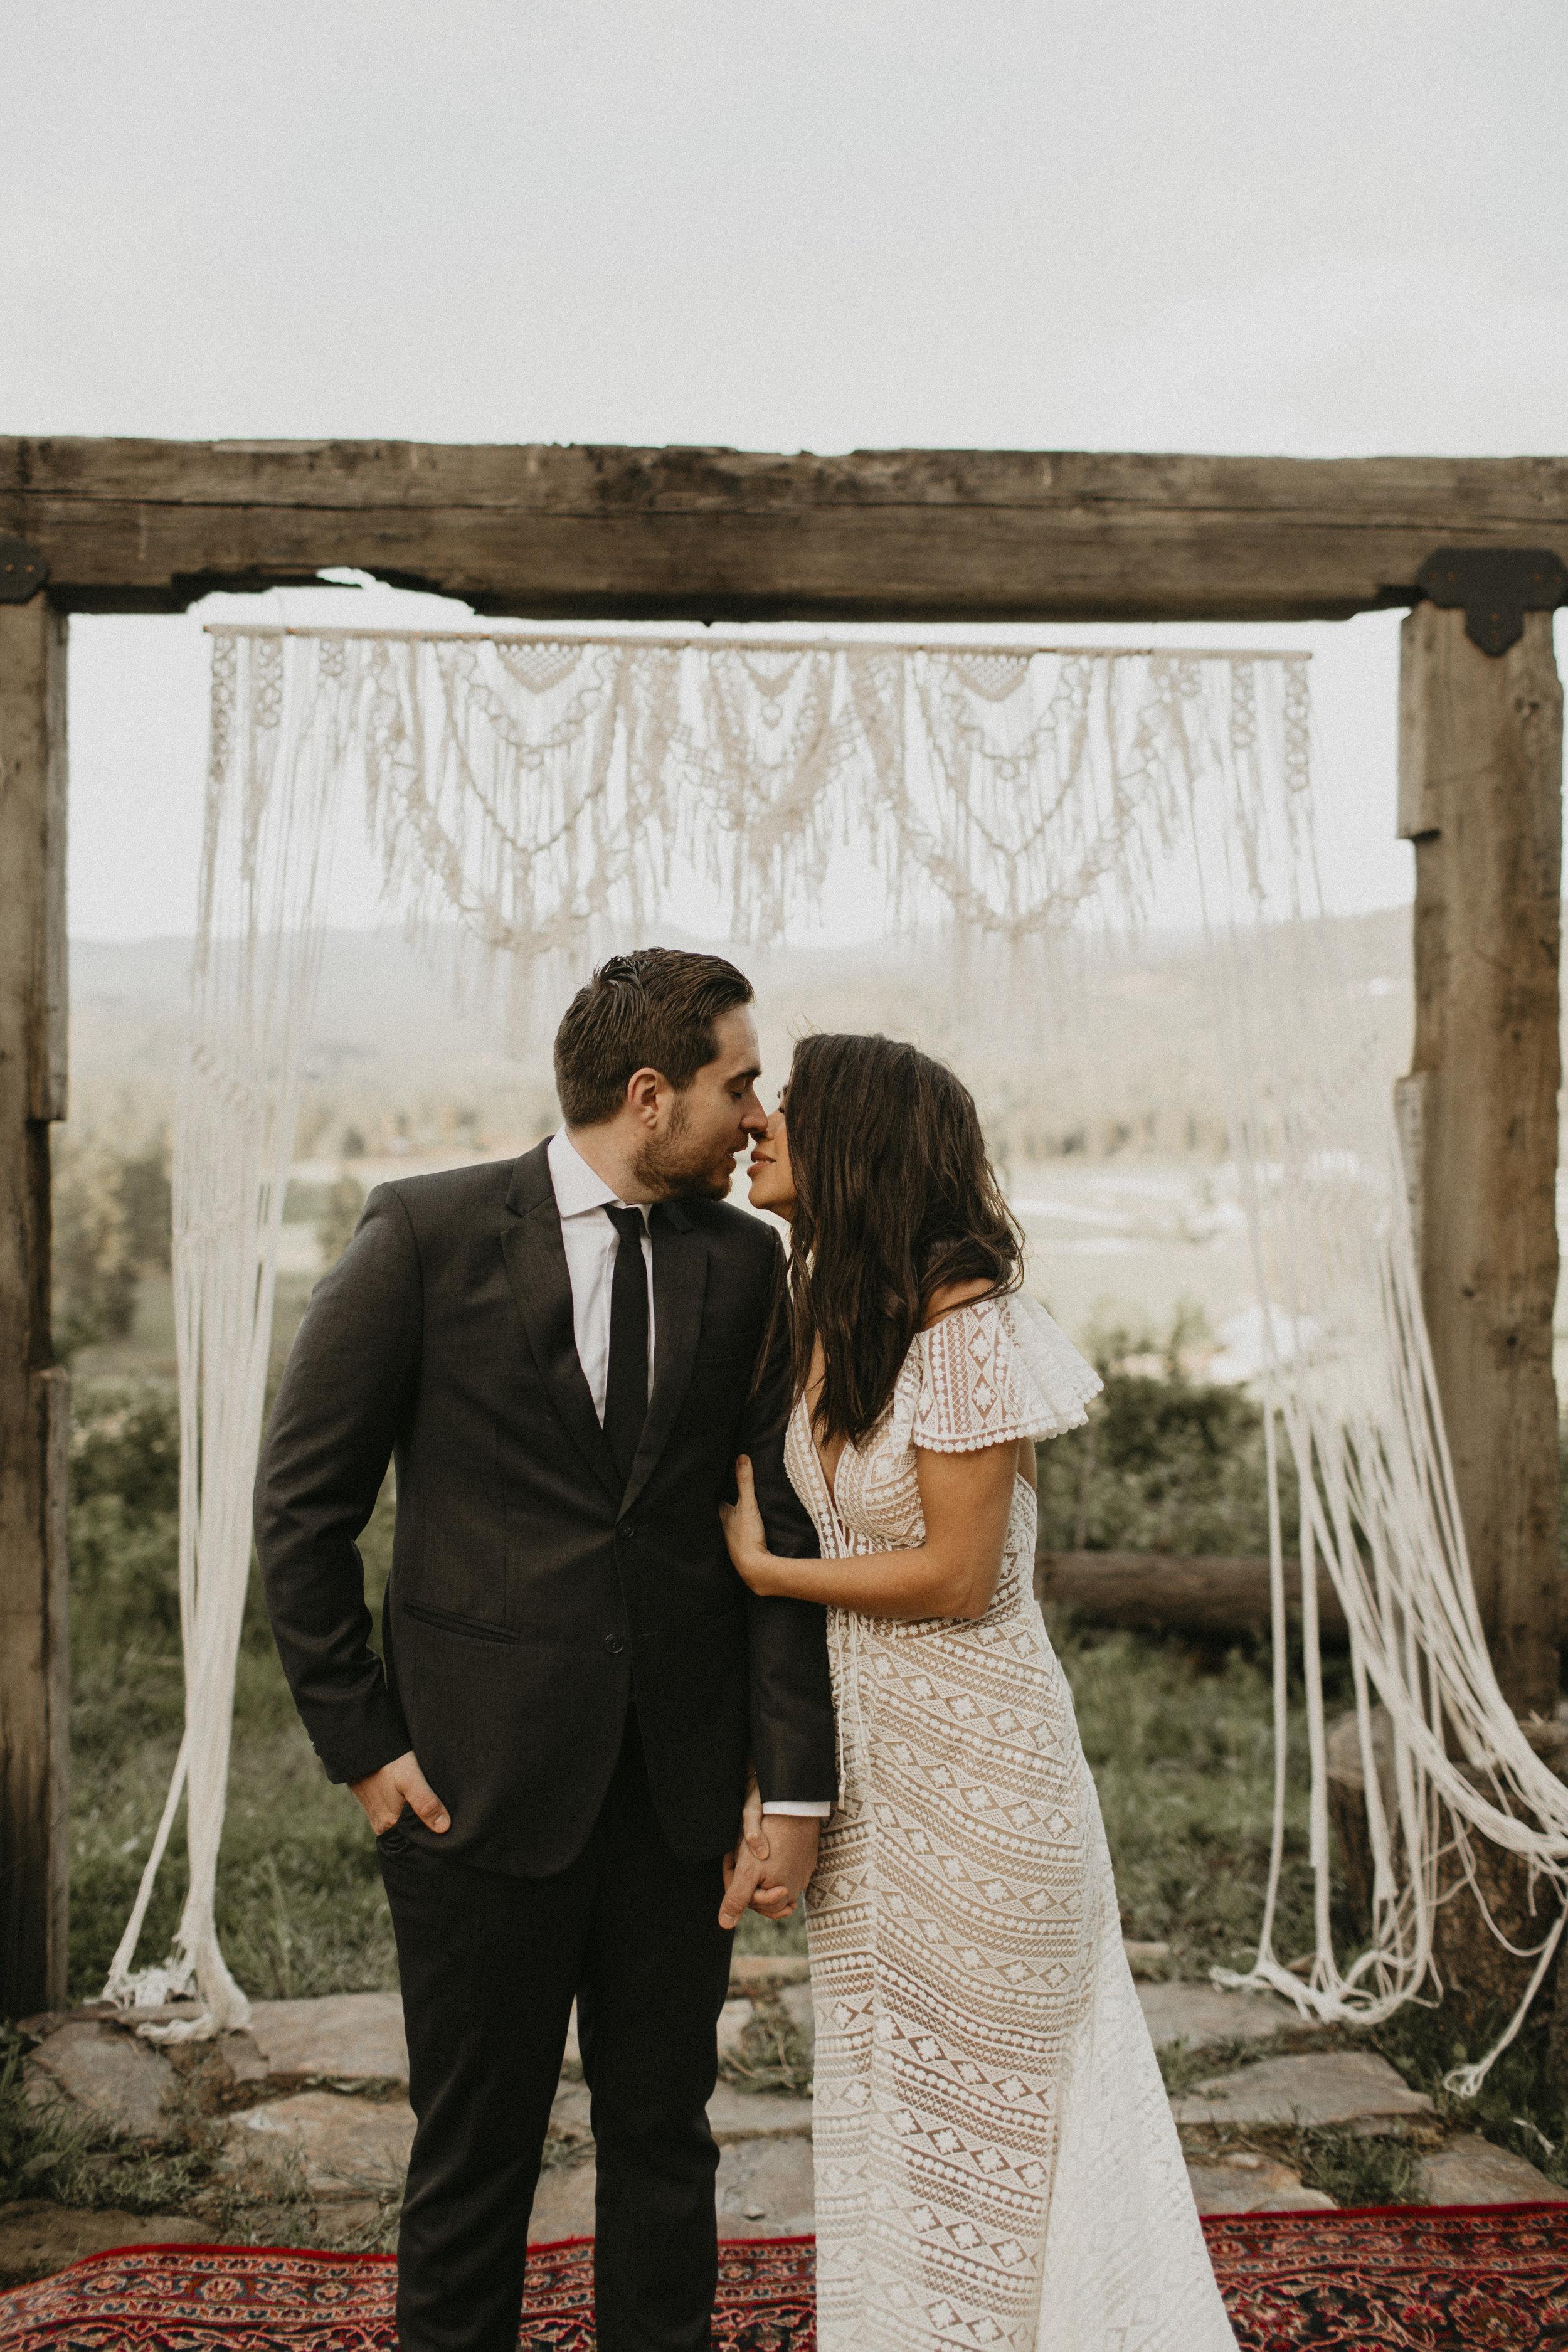 Spokane boho cattle wedding eskimo kiss holding hands wedding ceremony outside